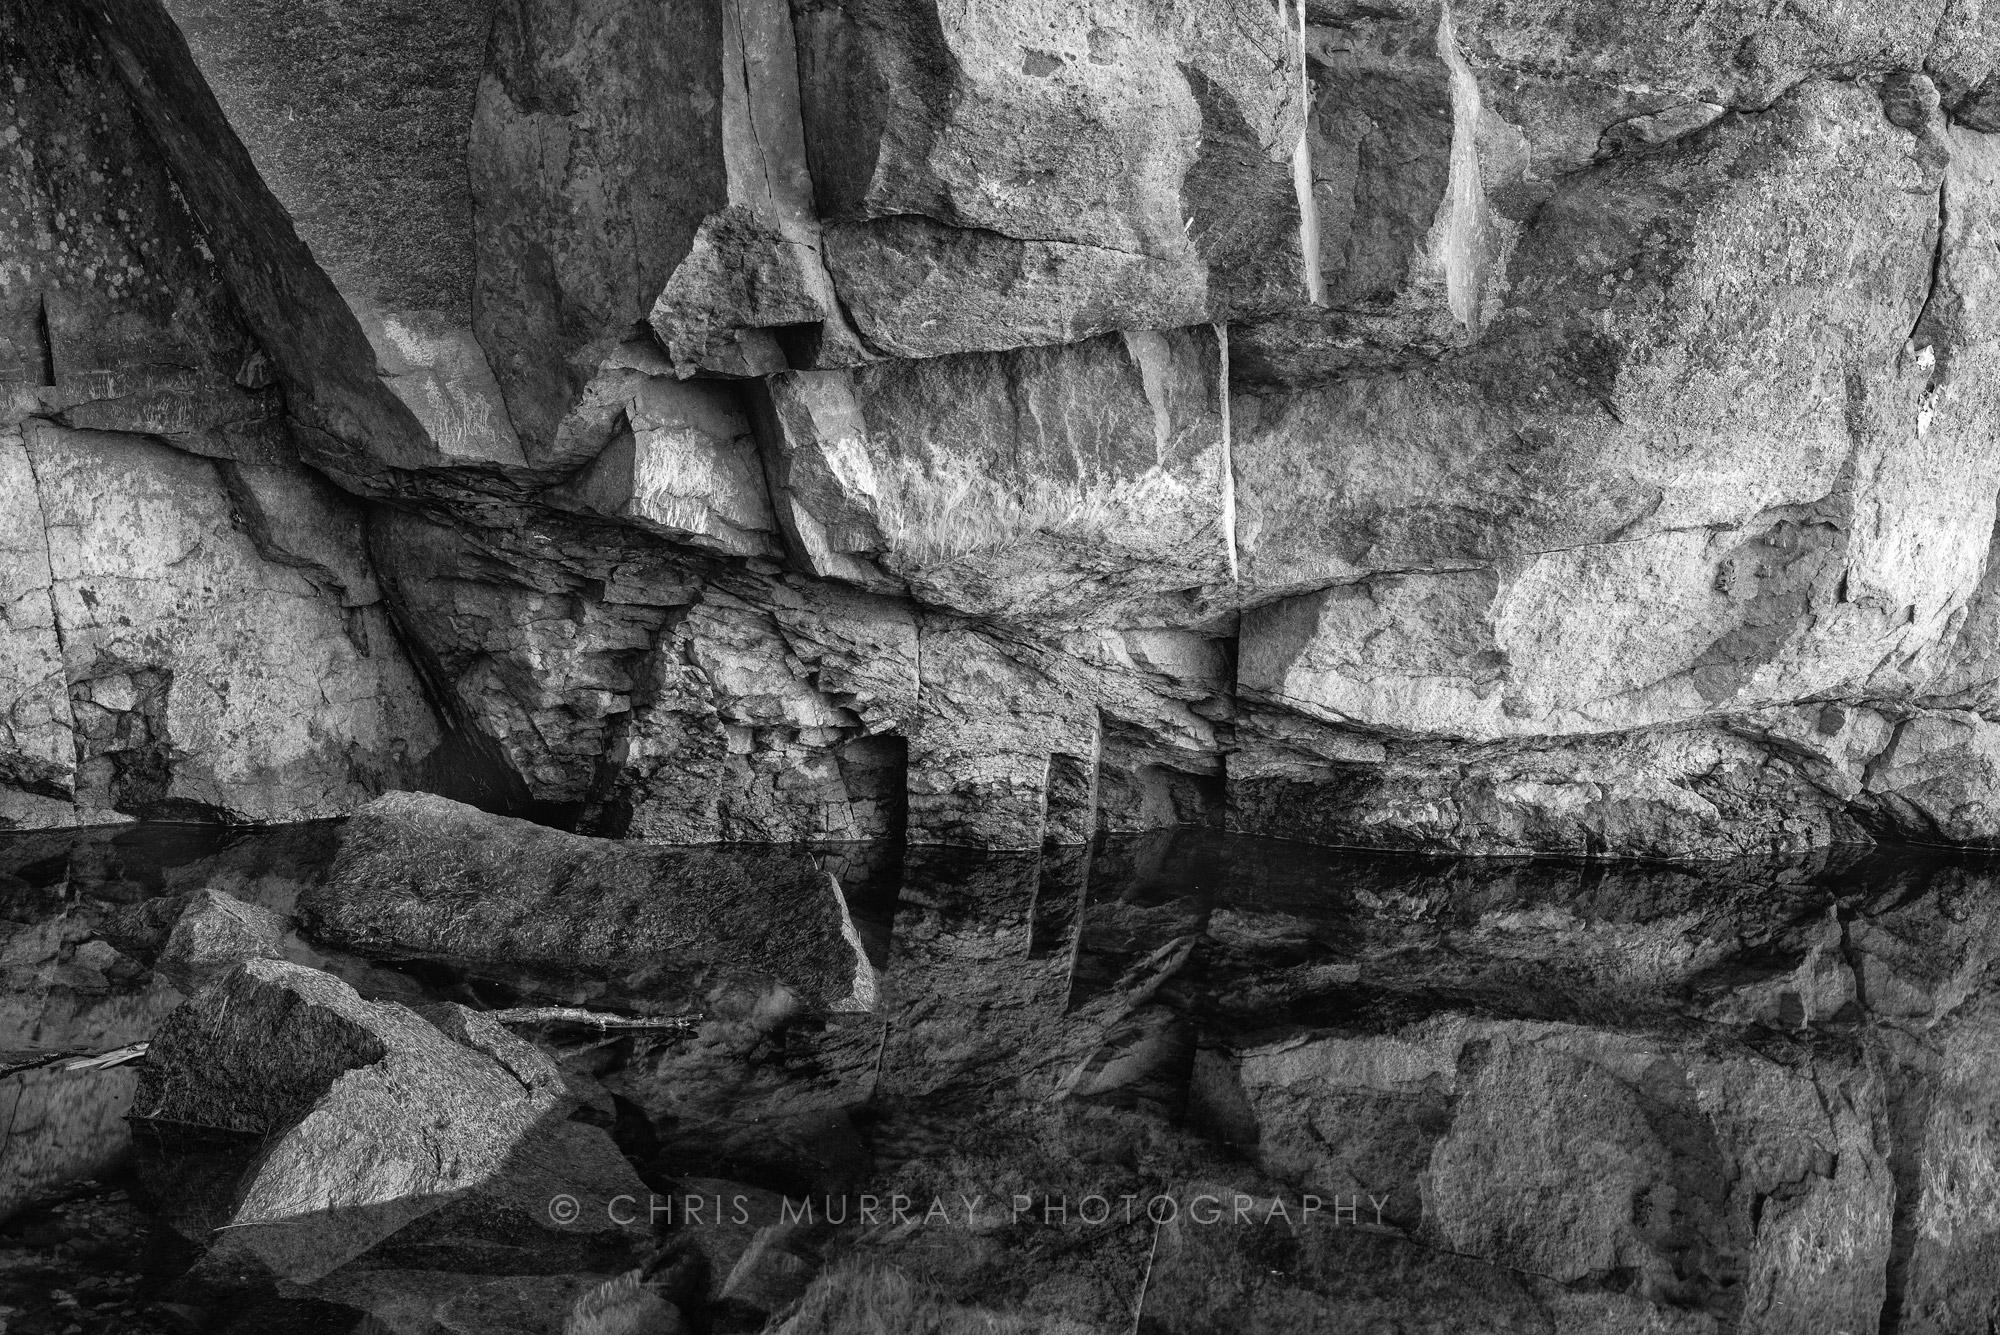 Granite Reflection / Chris Murray